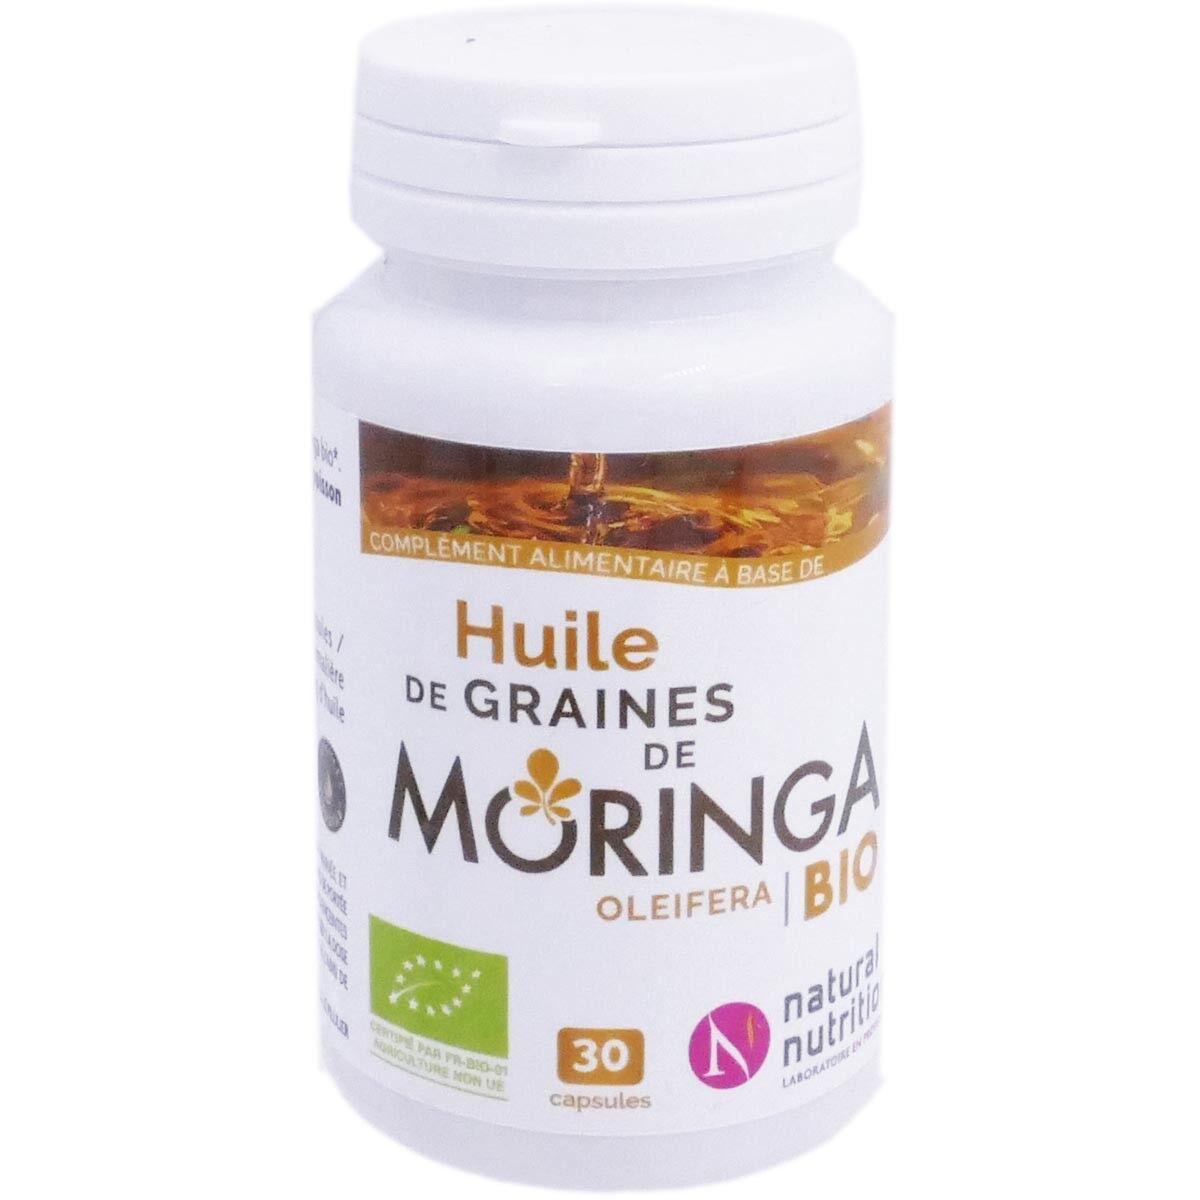 Natural nutrition huile de graines de moringa bio 30 capsules